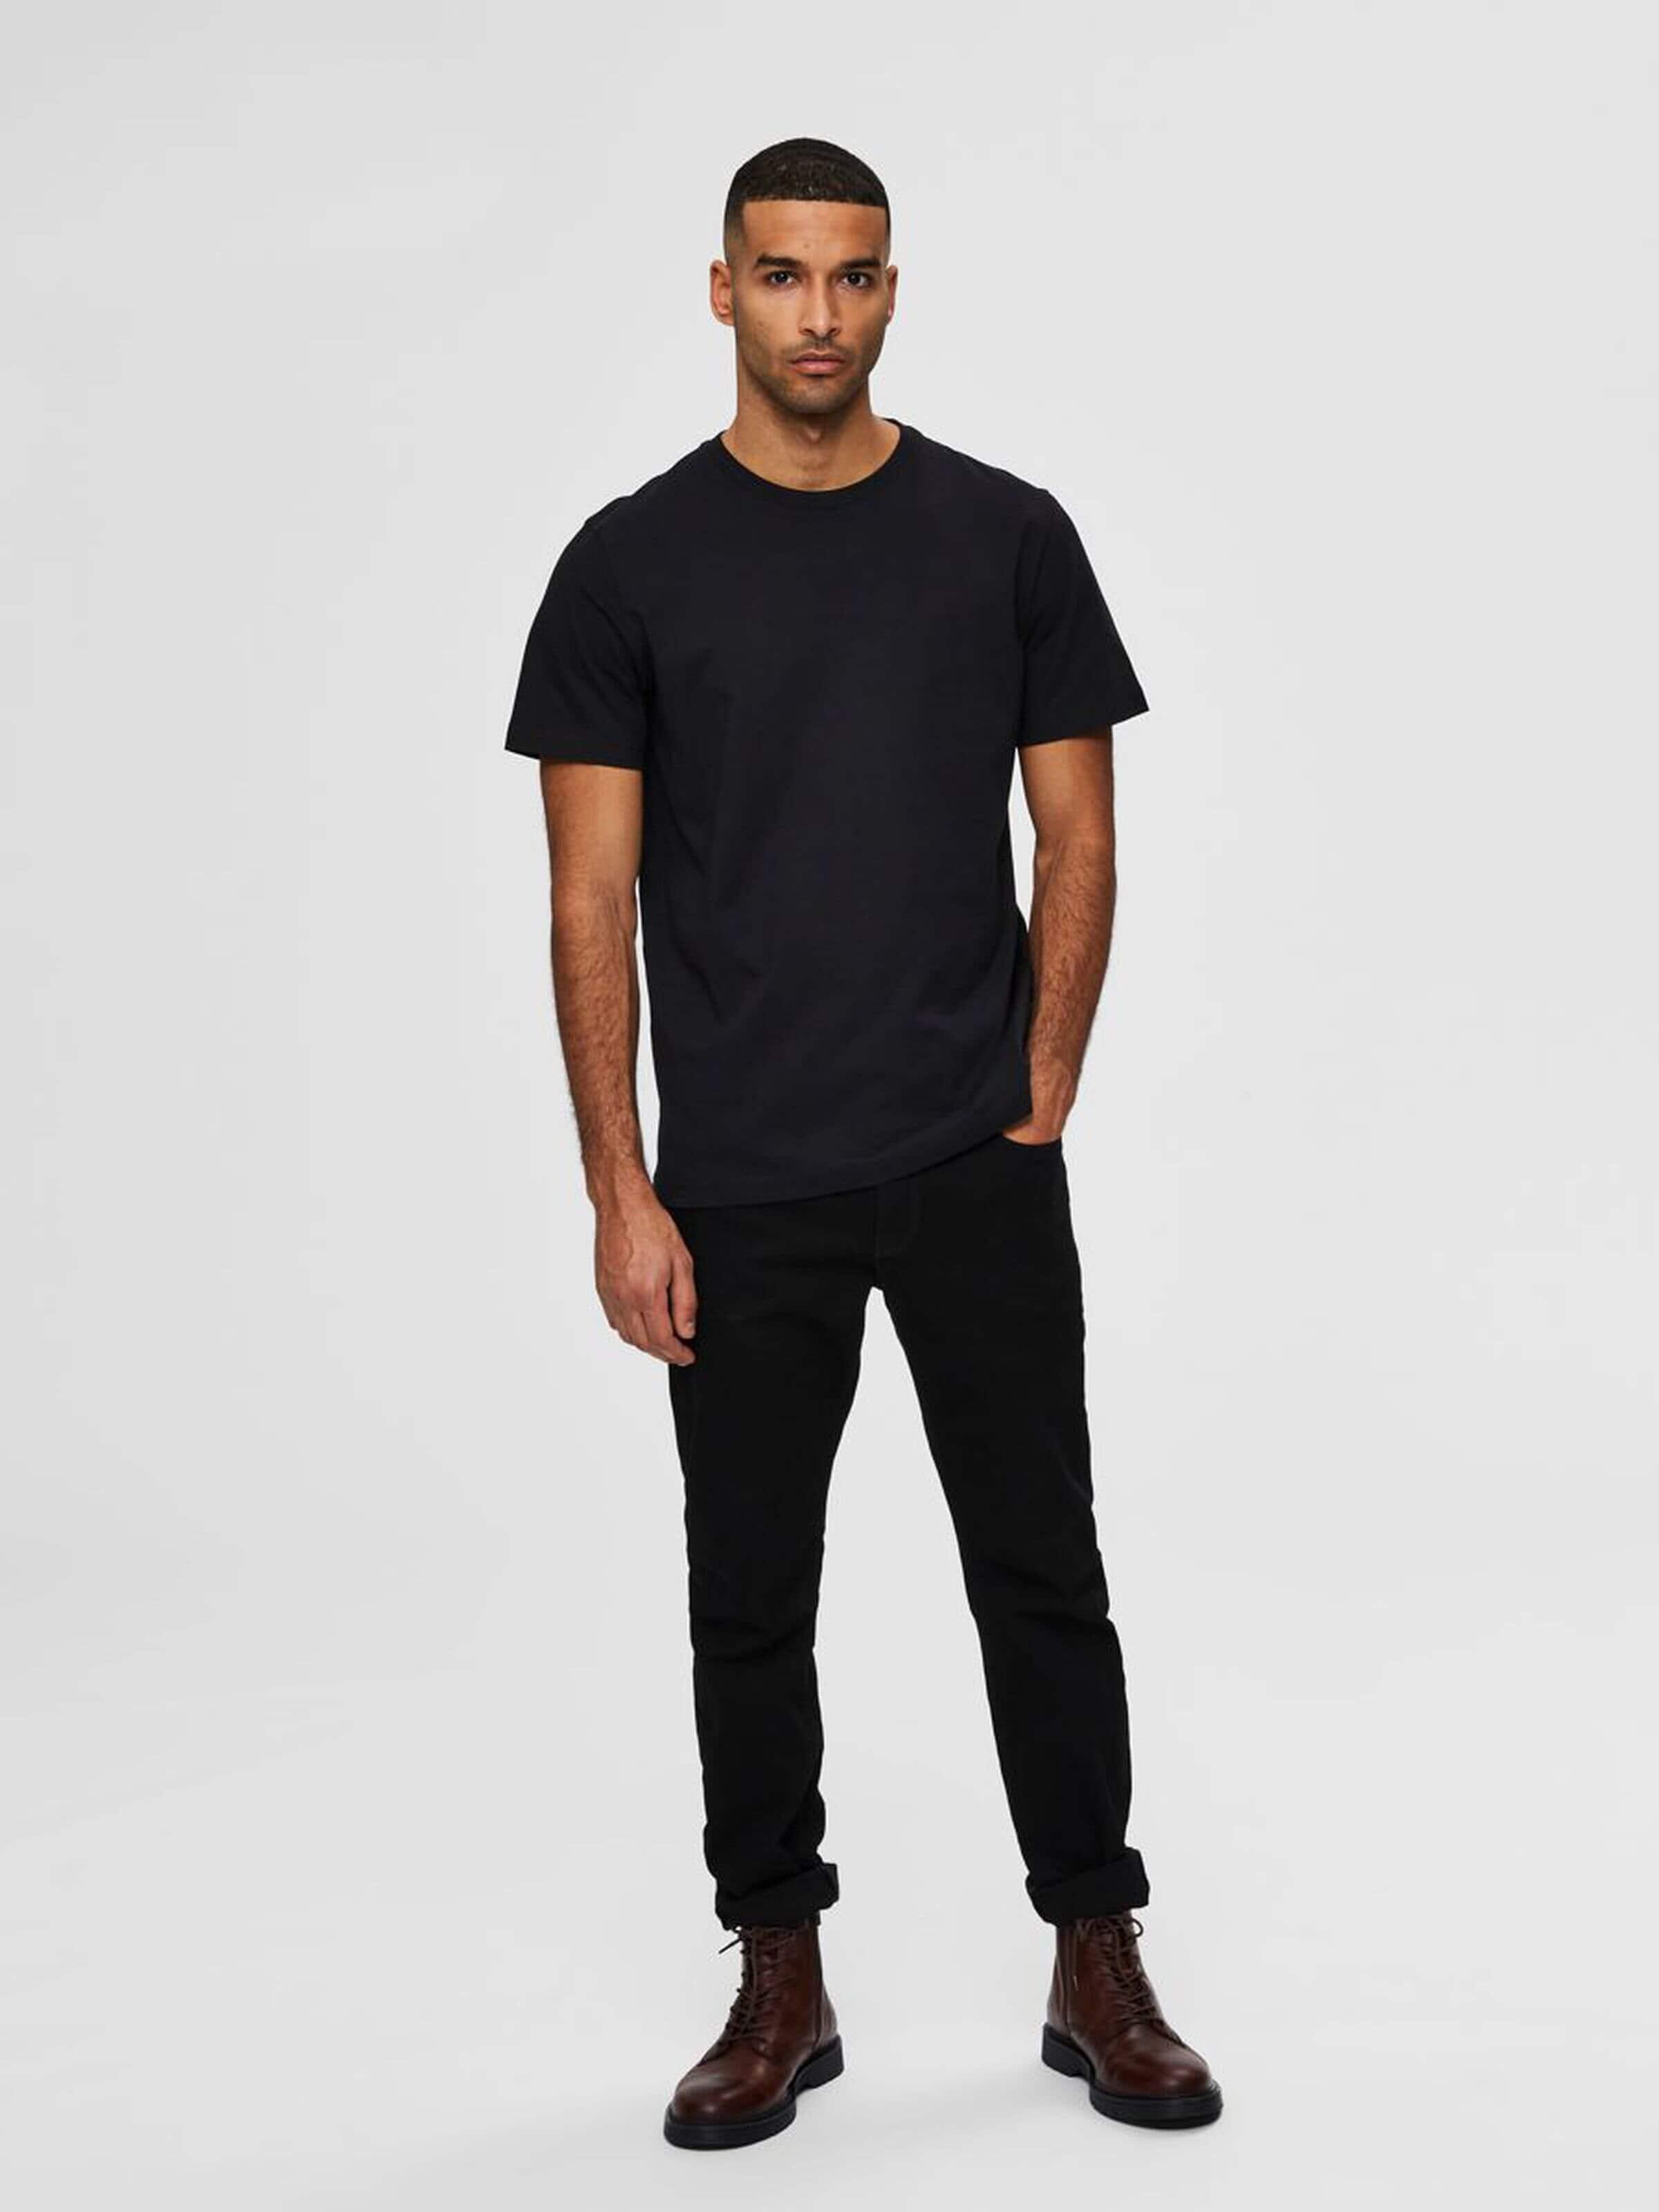 Slhnorman 180 T-Shirt - Black